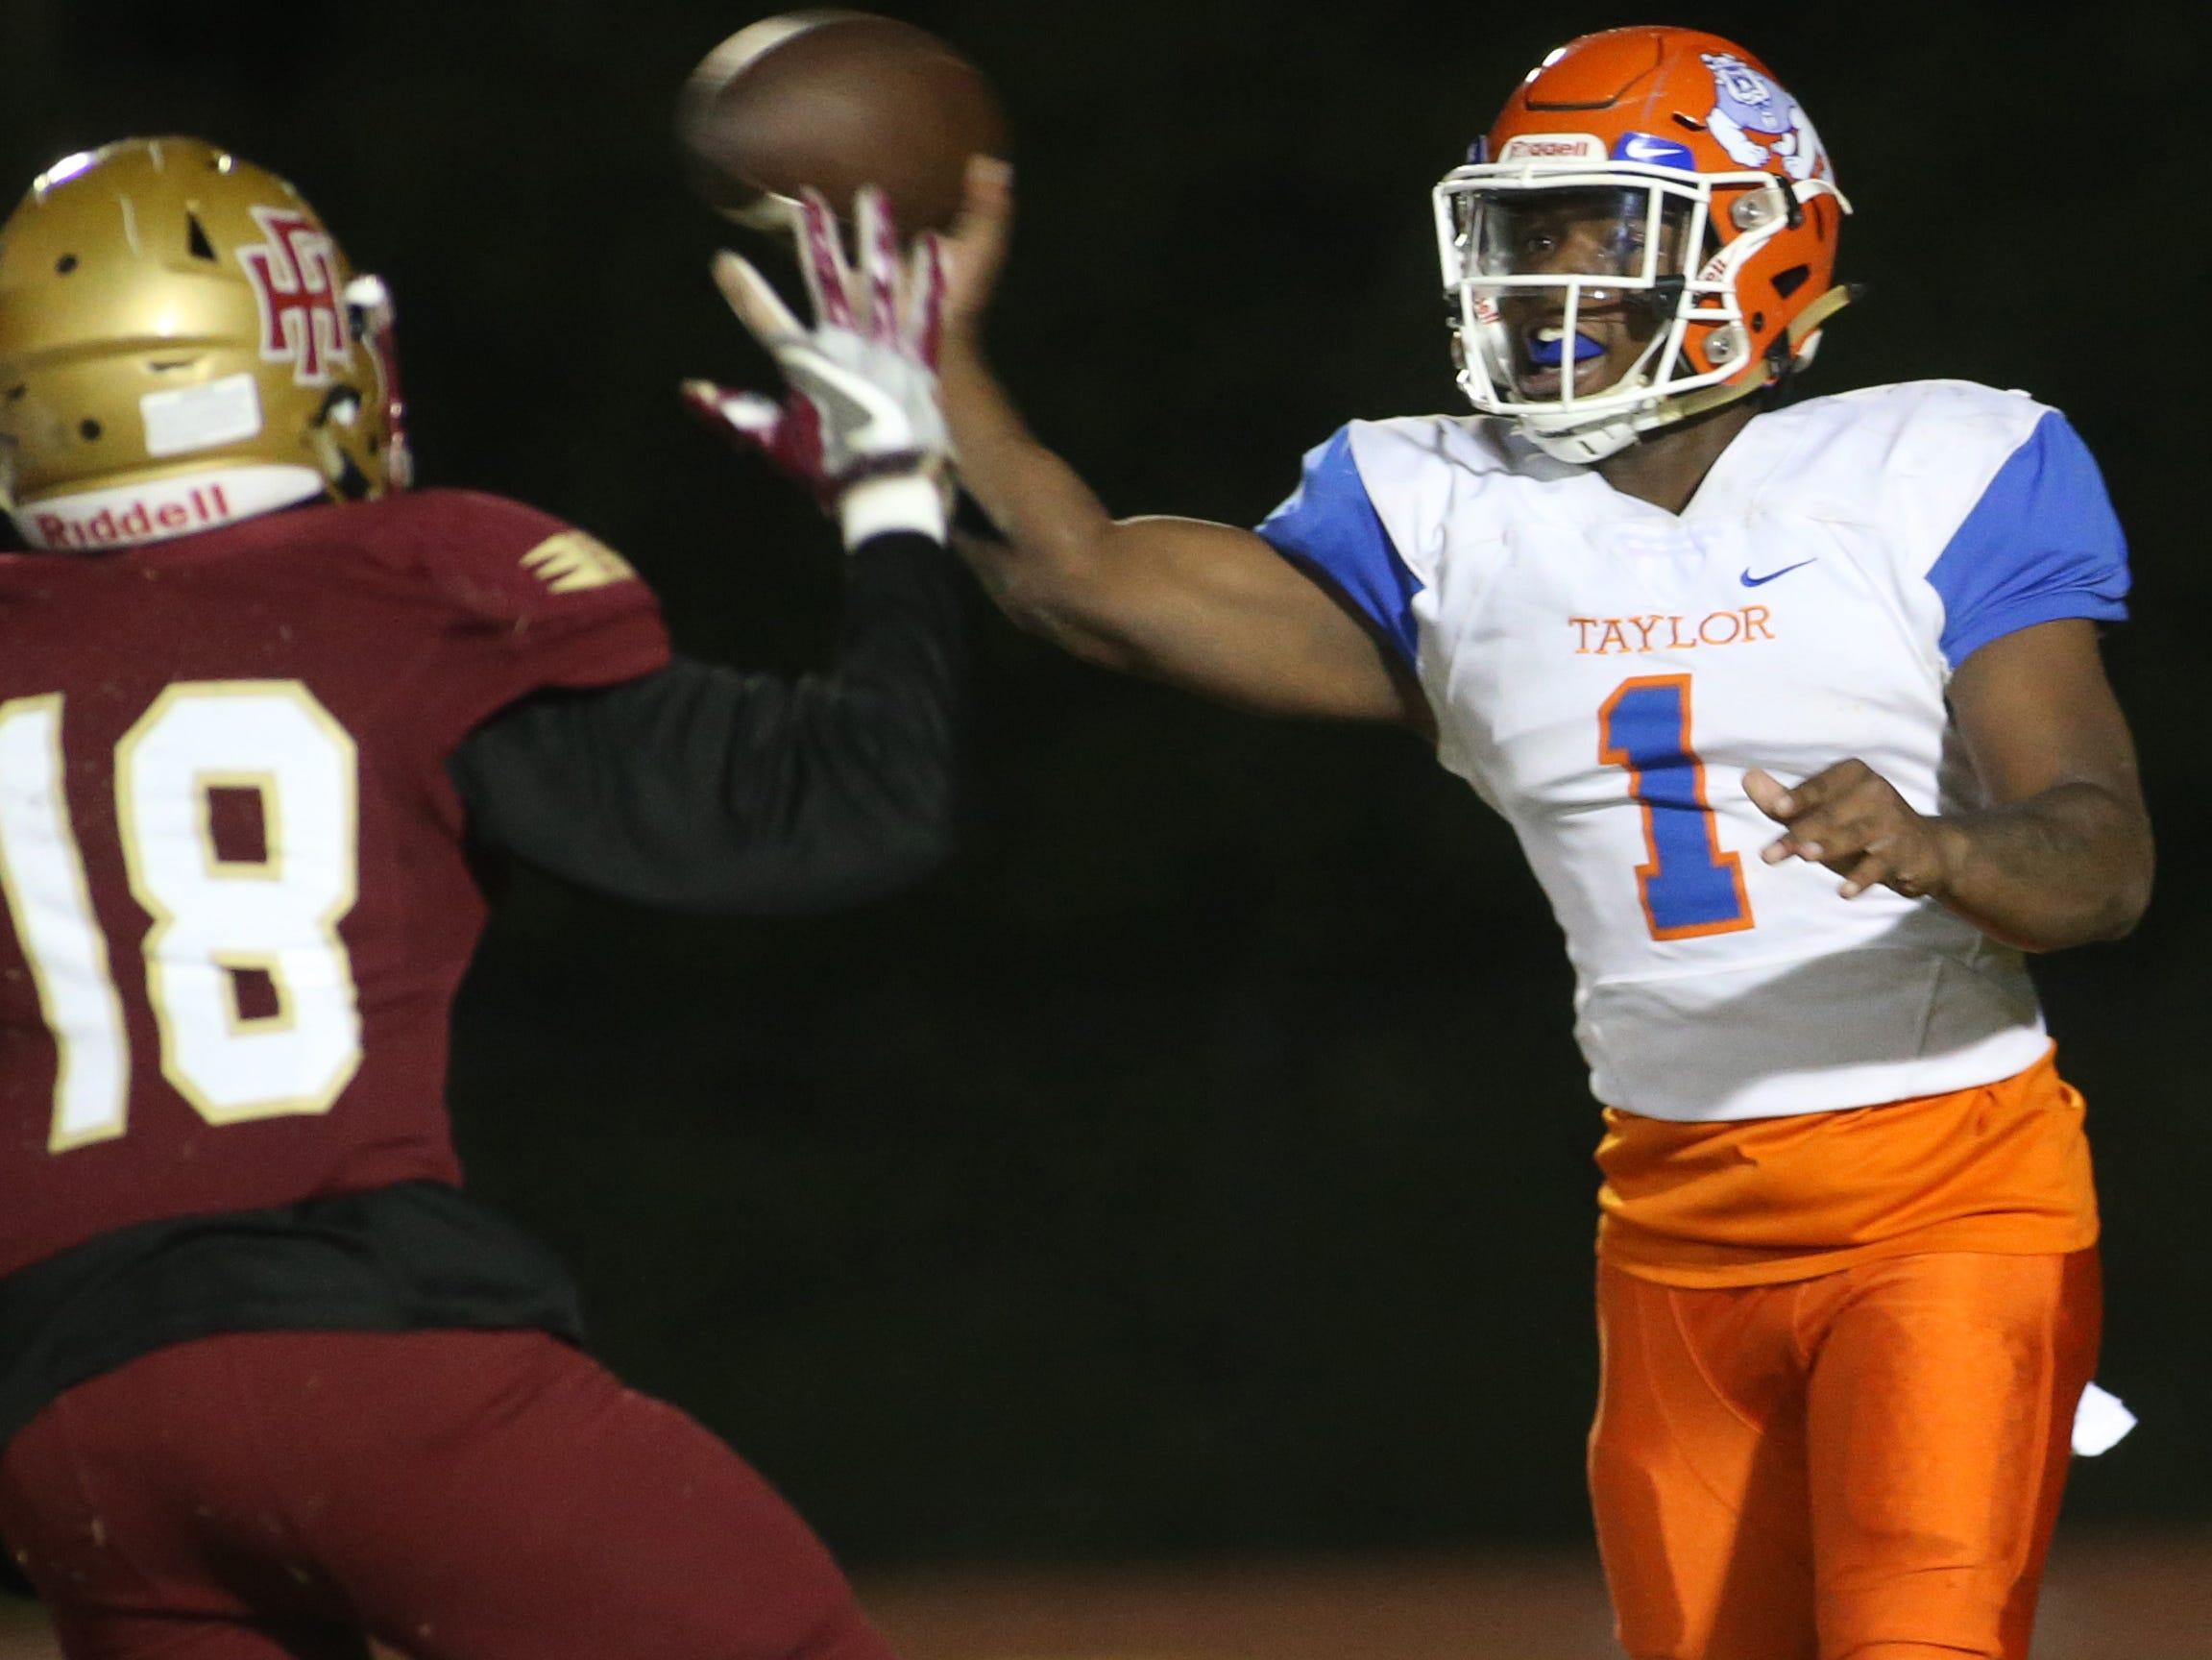 Taylor County Bulldog quarterback Da'corian Bellamy (1) passes as the Taylor County Bulldogs play the Florida High Seminoles in a Region 1-3A final on Friday, Nov. 23, 2018.